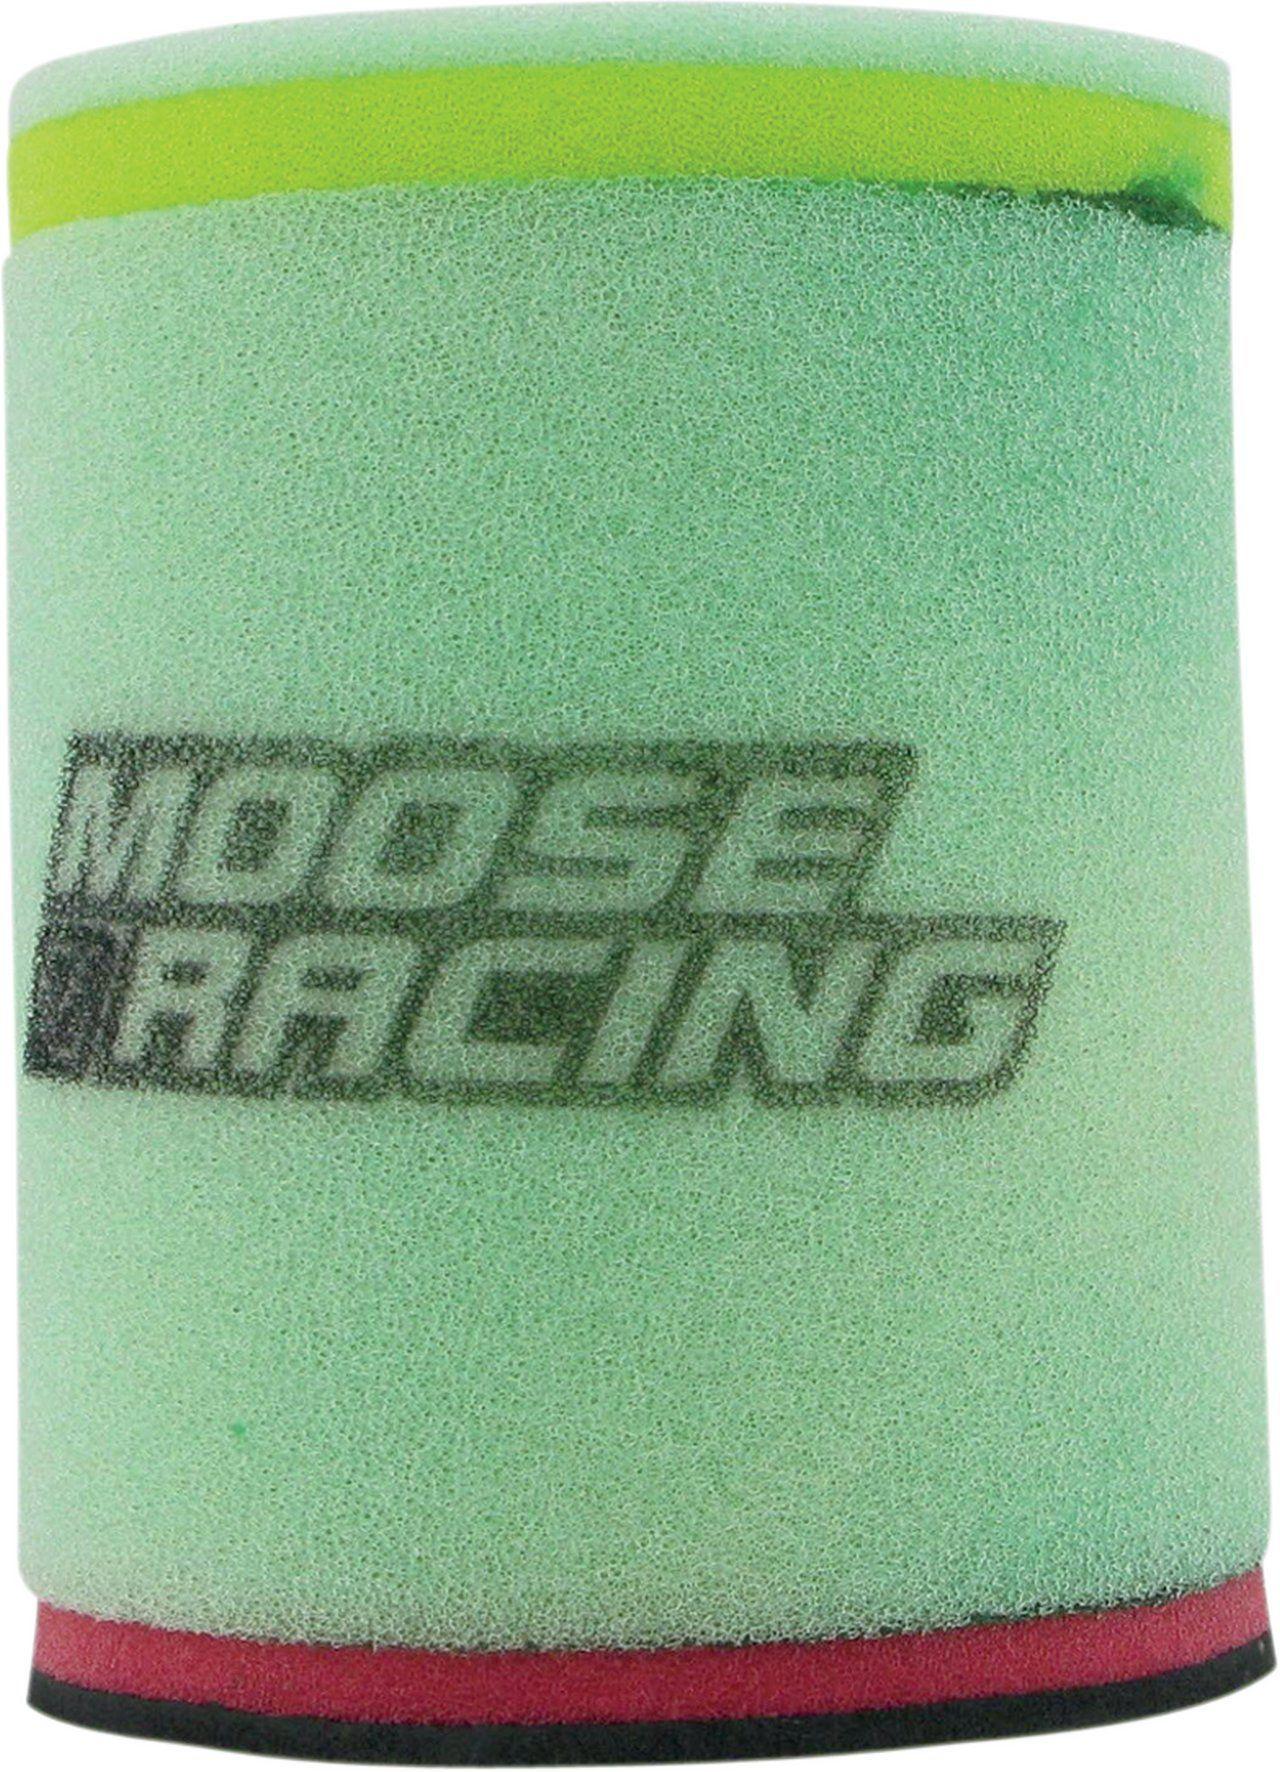 【MOOSE RACING】PPO (PRECISION PRE-OILED) 空氣濾芯 [1011-1404] - 「Webike-摩托百貨」